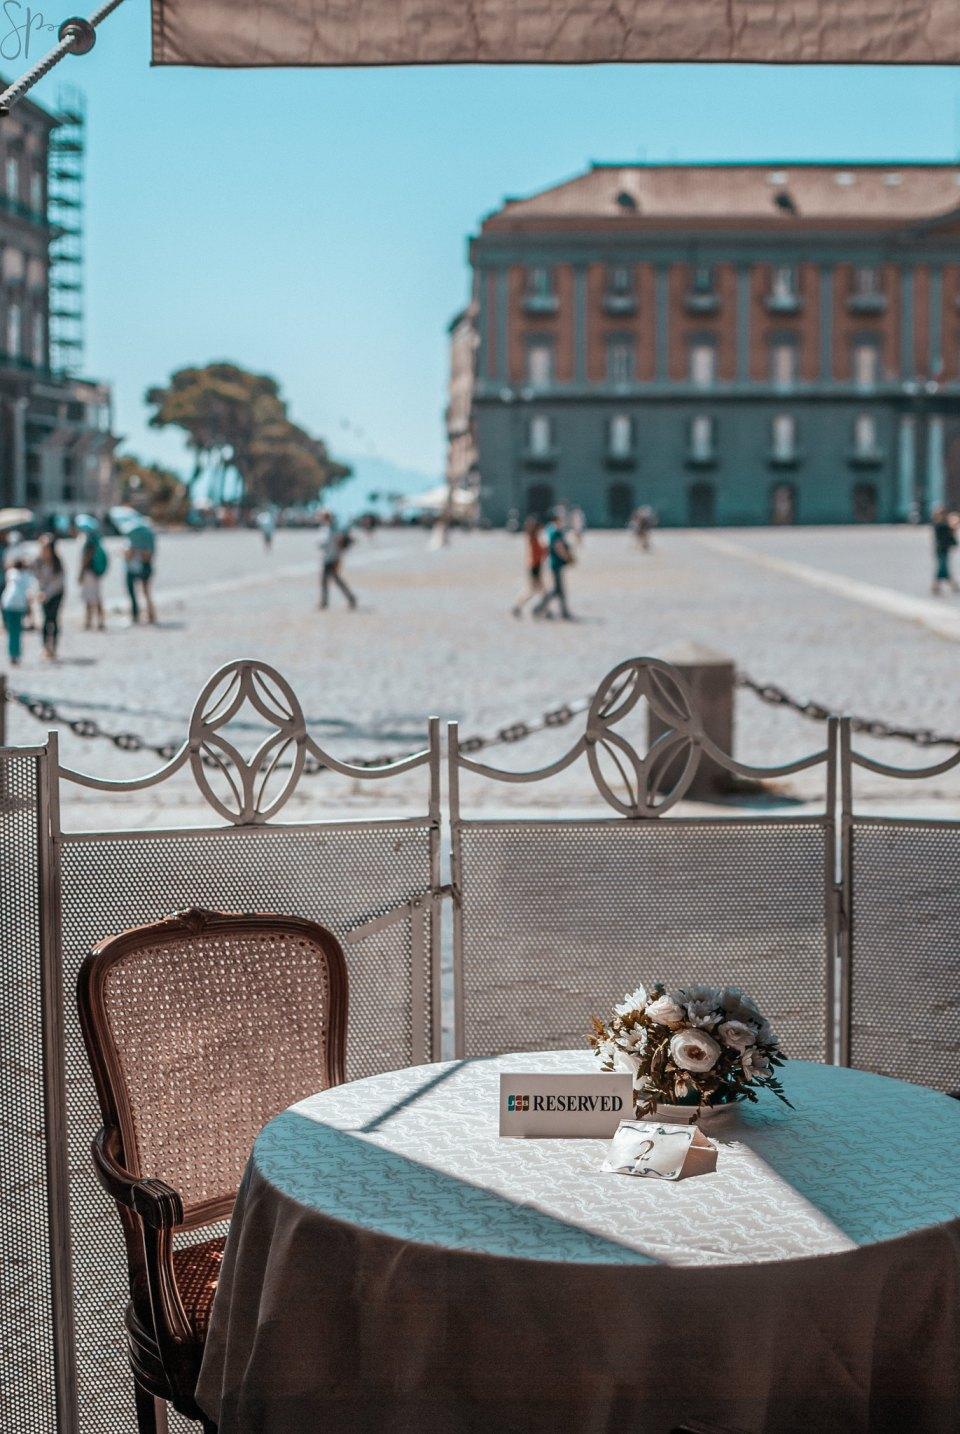 Gran Caffè Gambrinus, Napoli